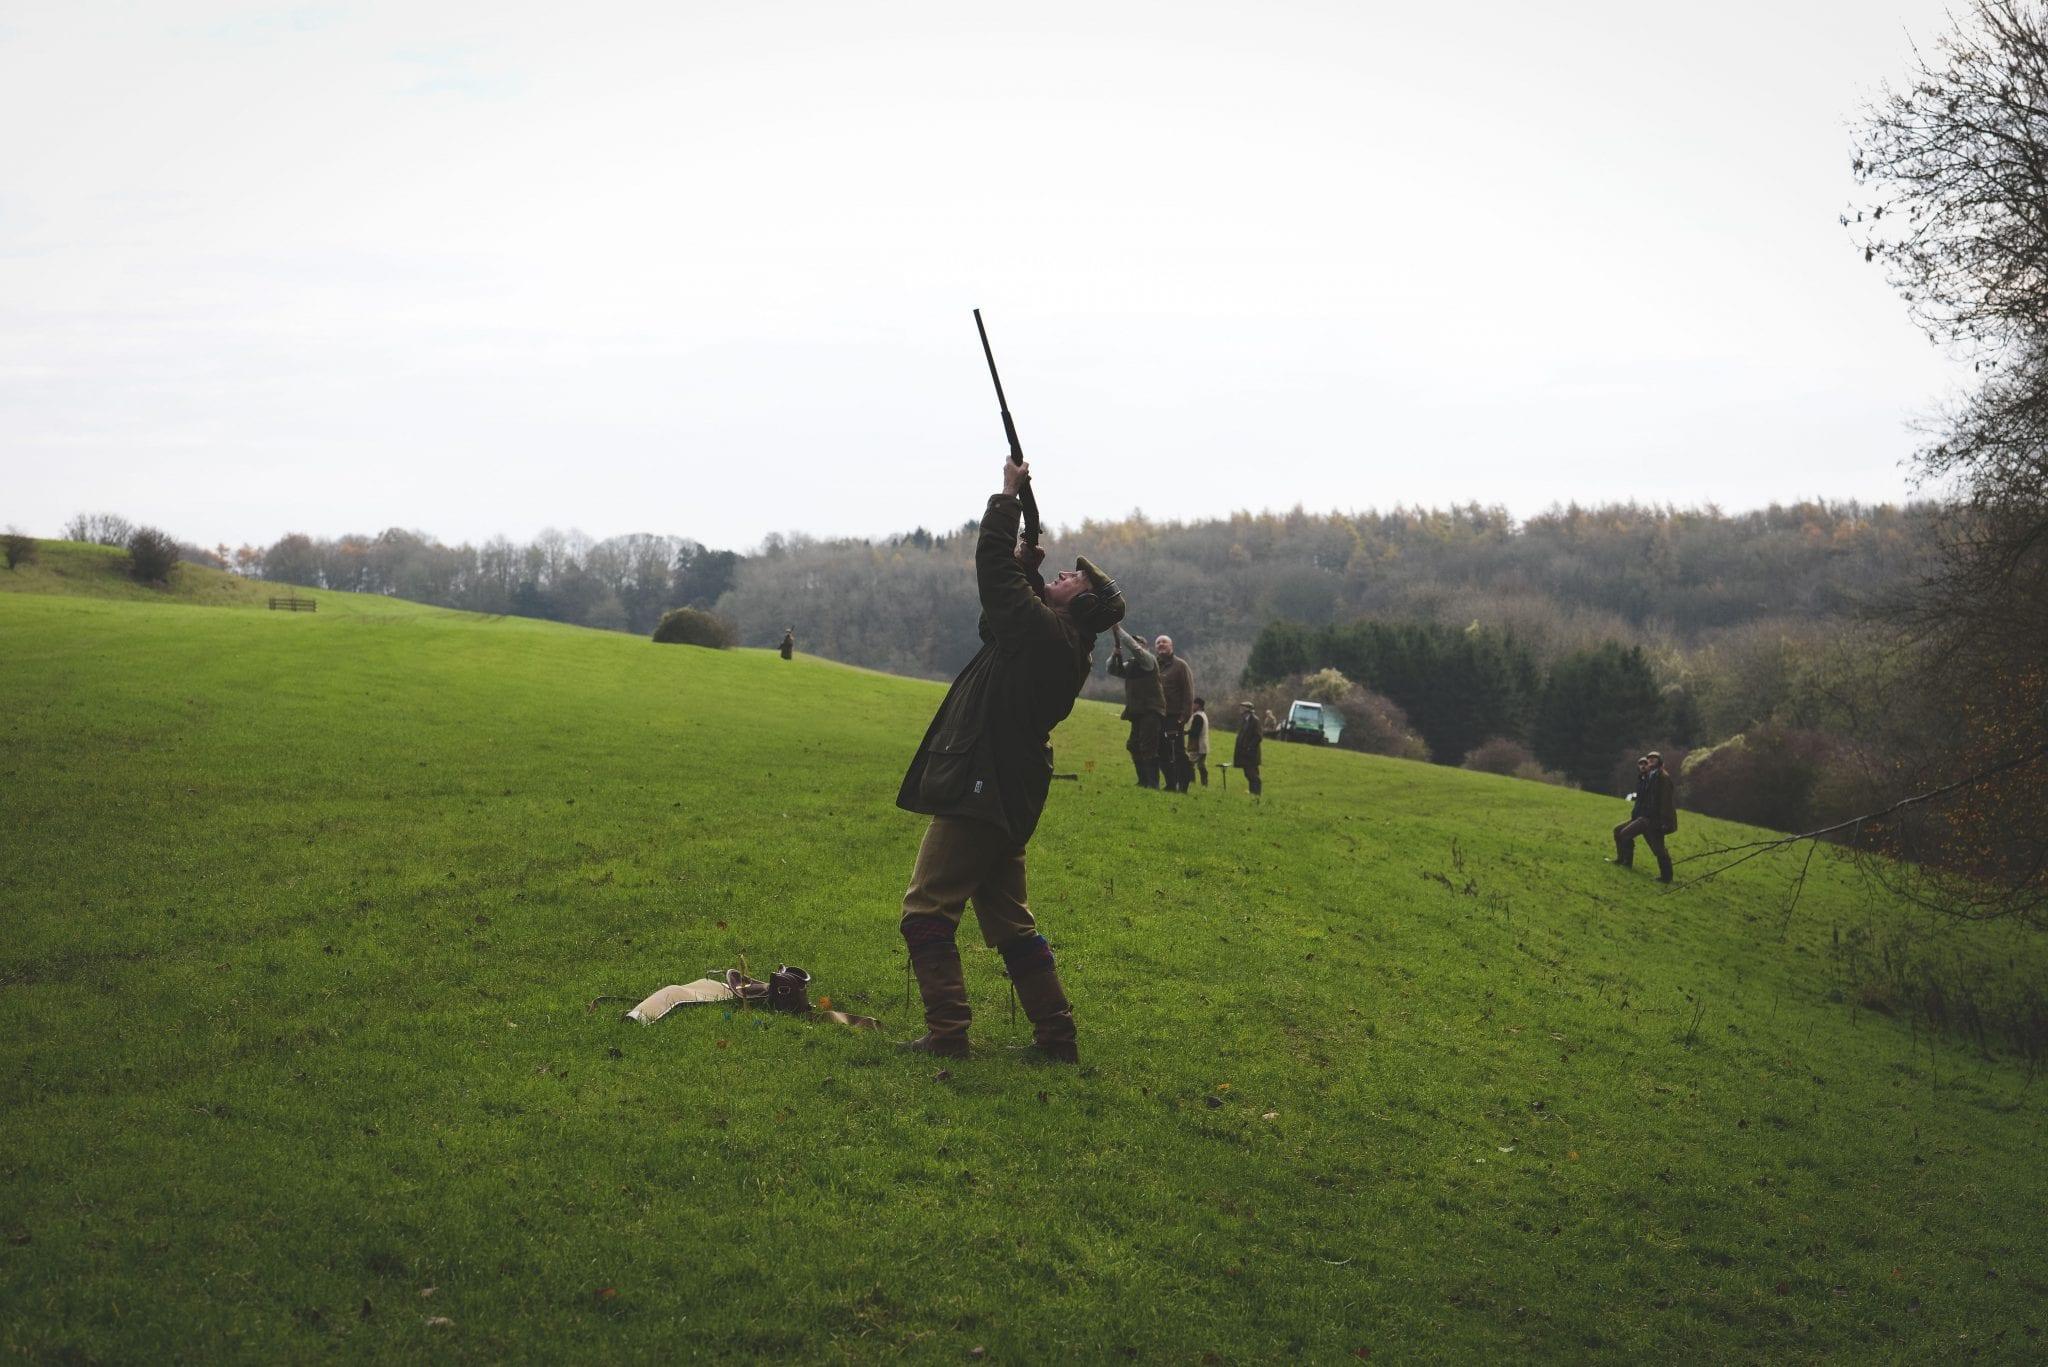 A gun aims at bird during a game shooting drive